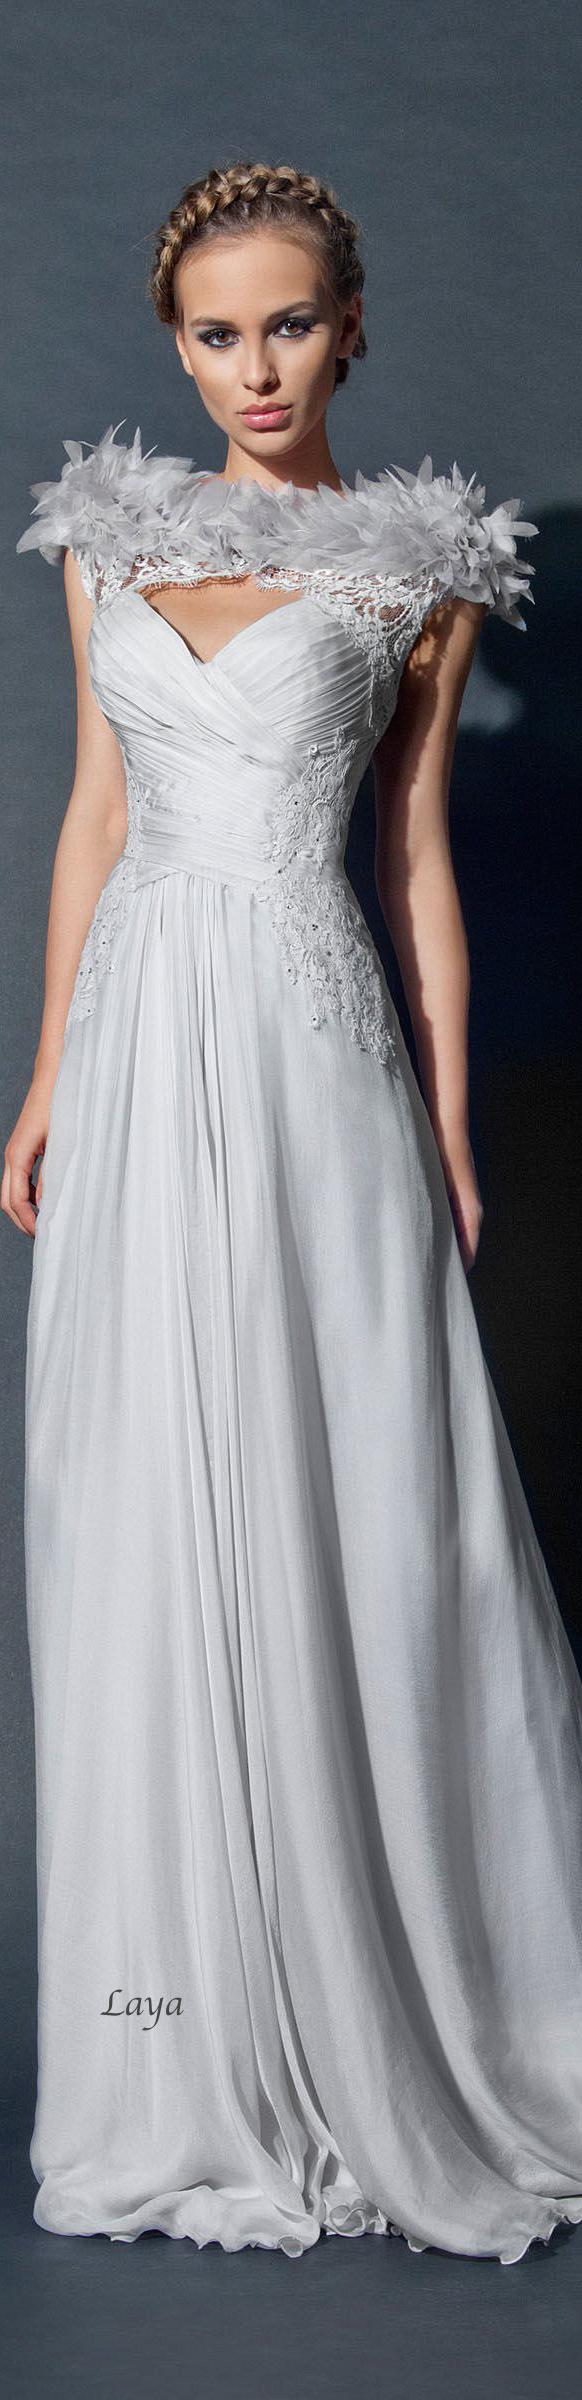 Chrystelle Atallah Bridal Couture jαɢlαdy